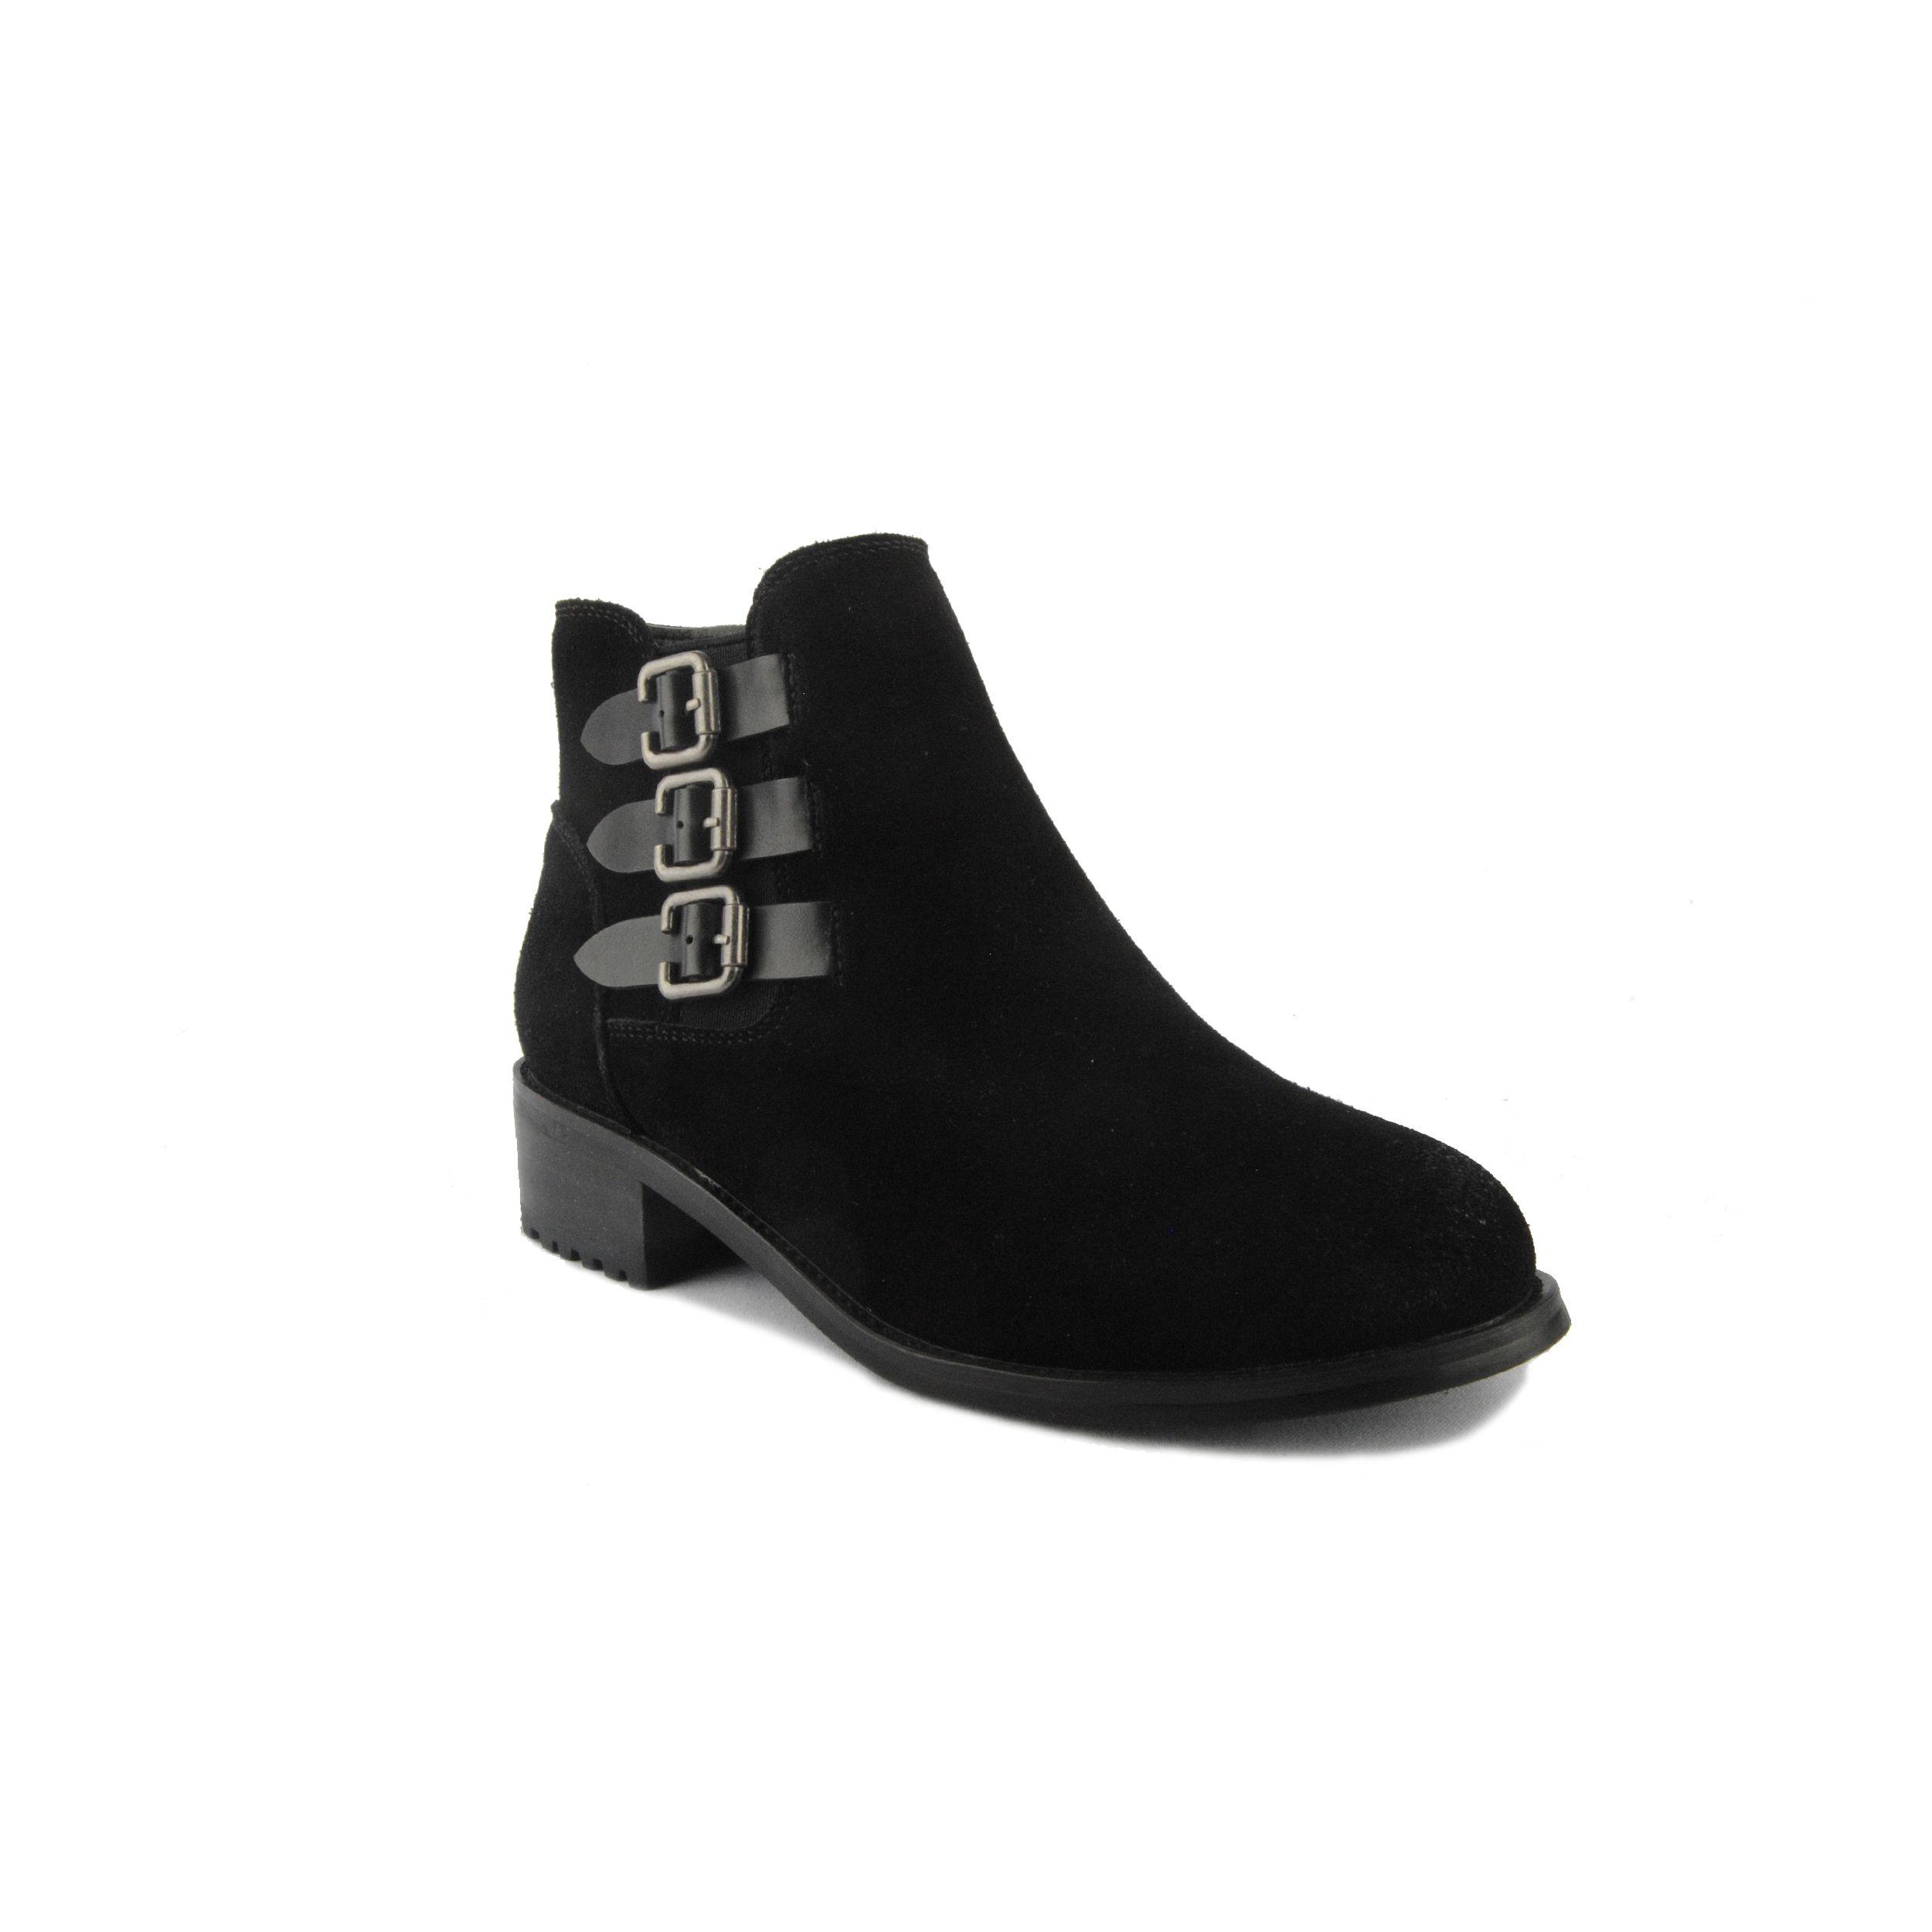 Montevita Buckle Ankle Boot in Black